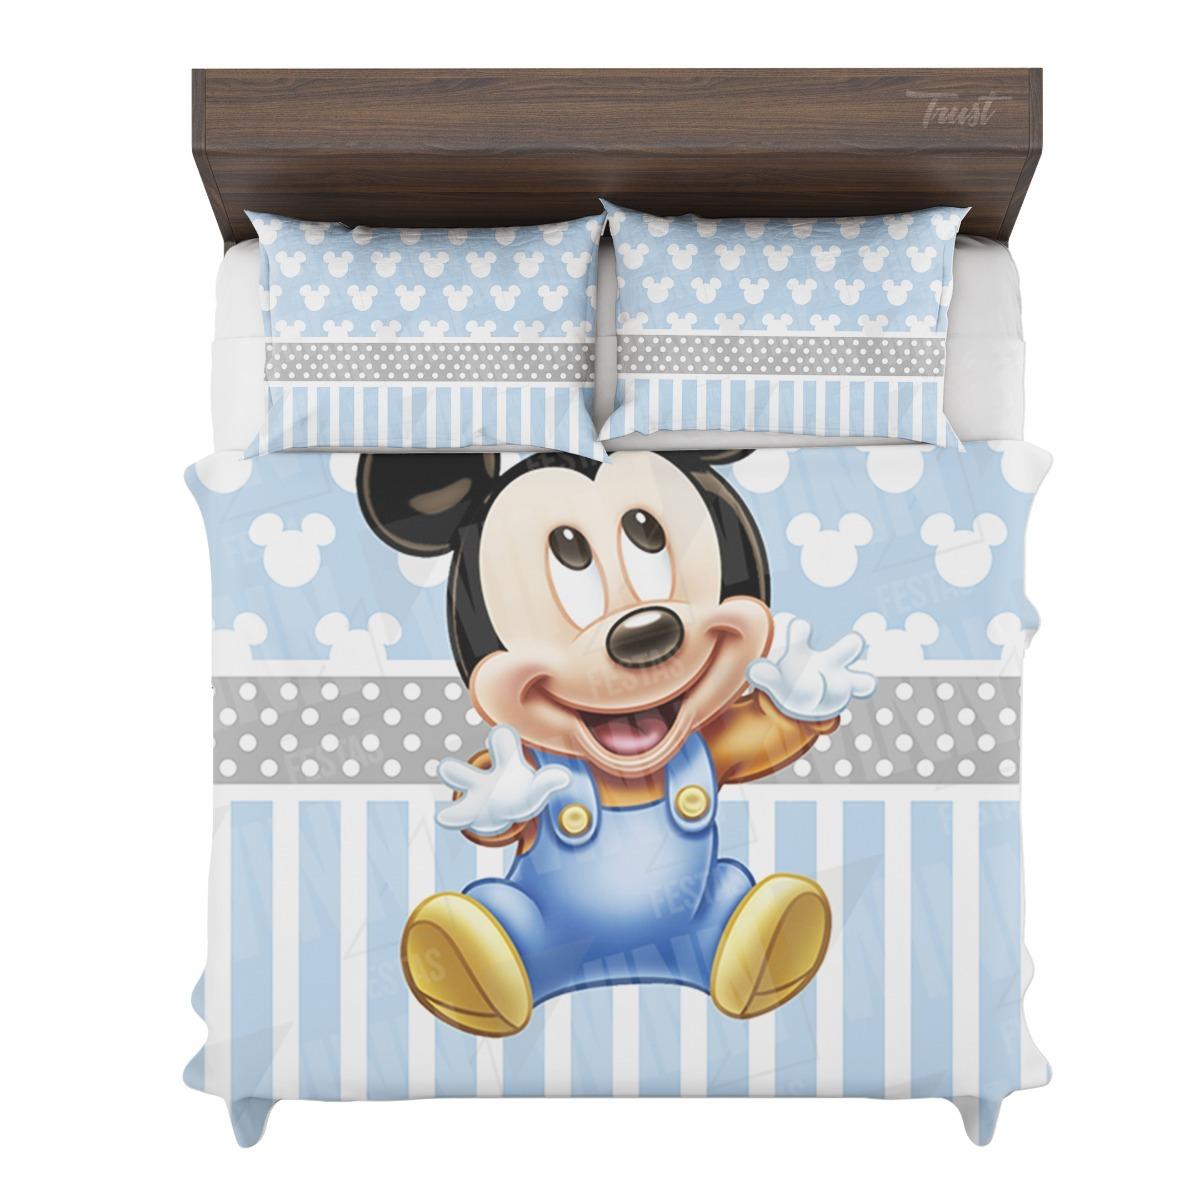 498f19823d jogo cama casal queen size infantil menino baby mickey fofo. Carregando  zoom.